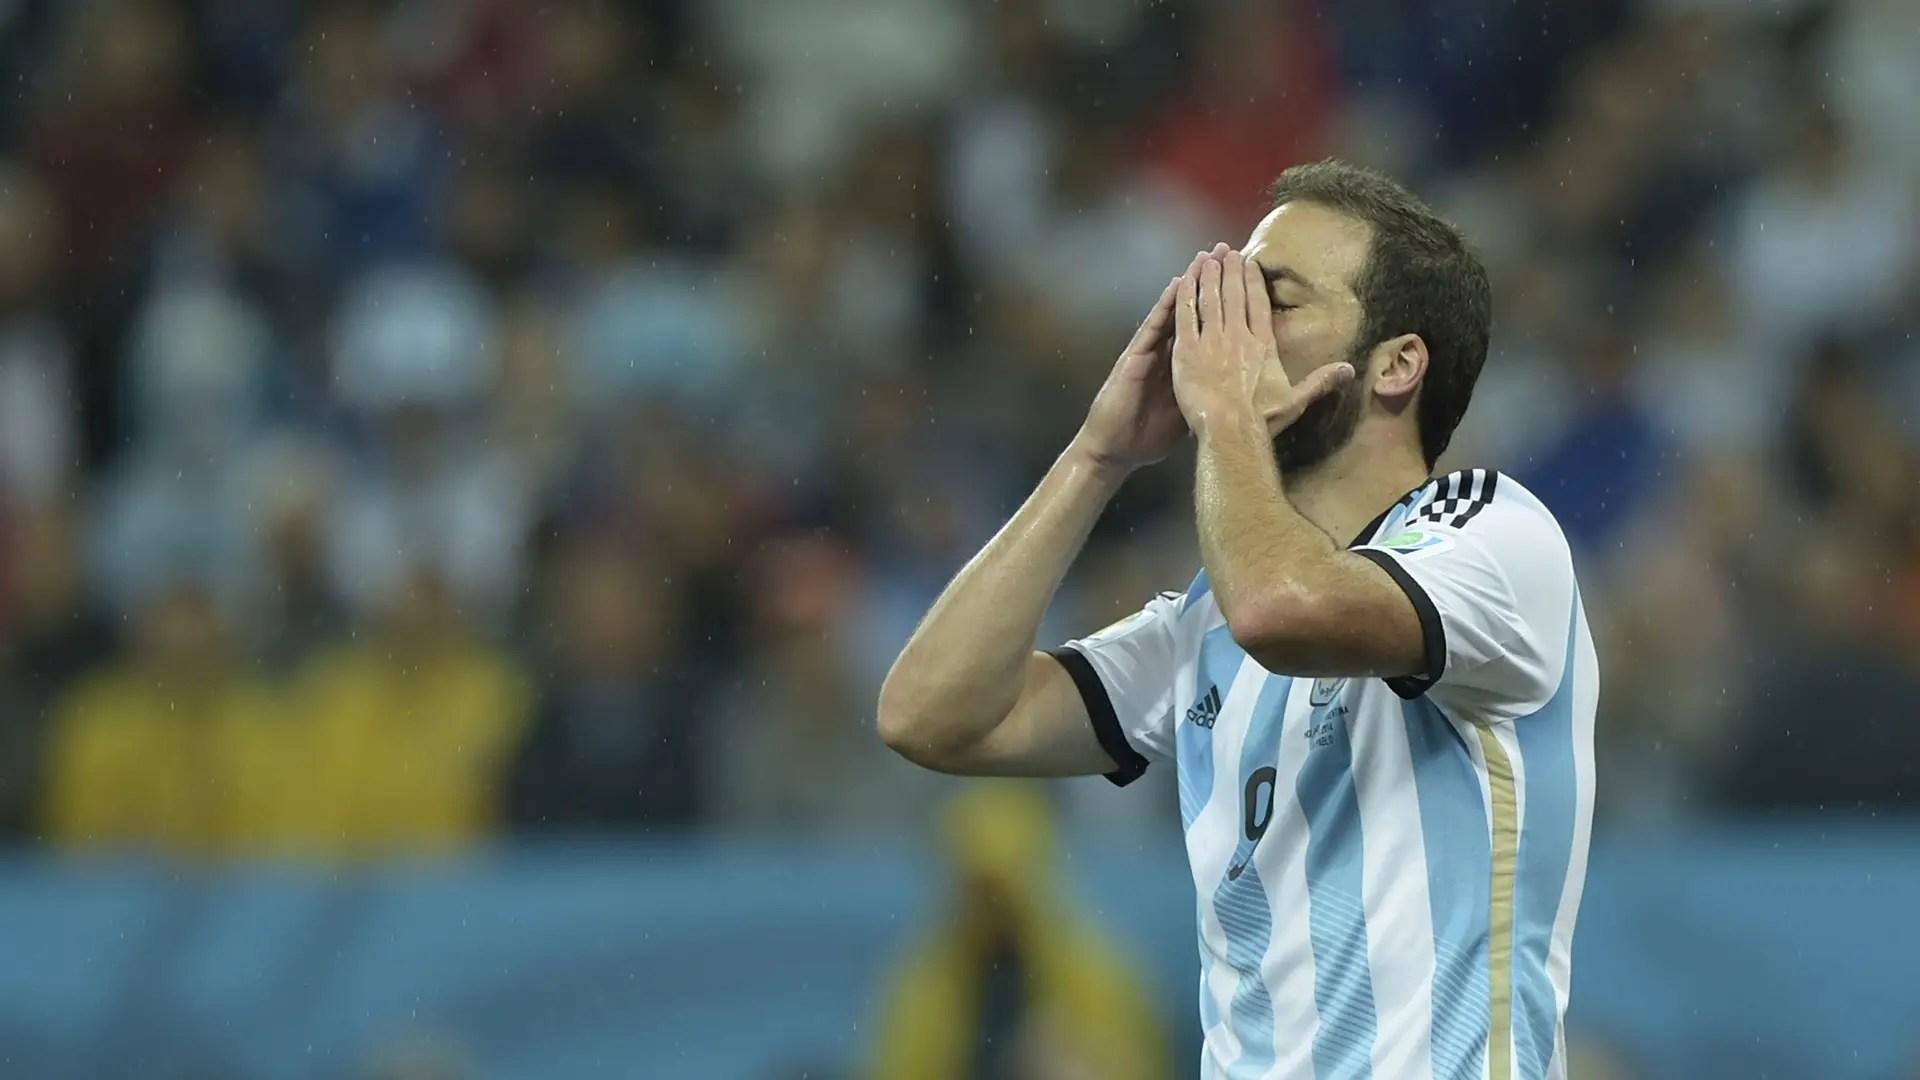 Argentina Ignore Higuain Again For Nigeria, Russia Friendlies; Messi, Aguero, Dybala Invited